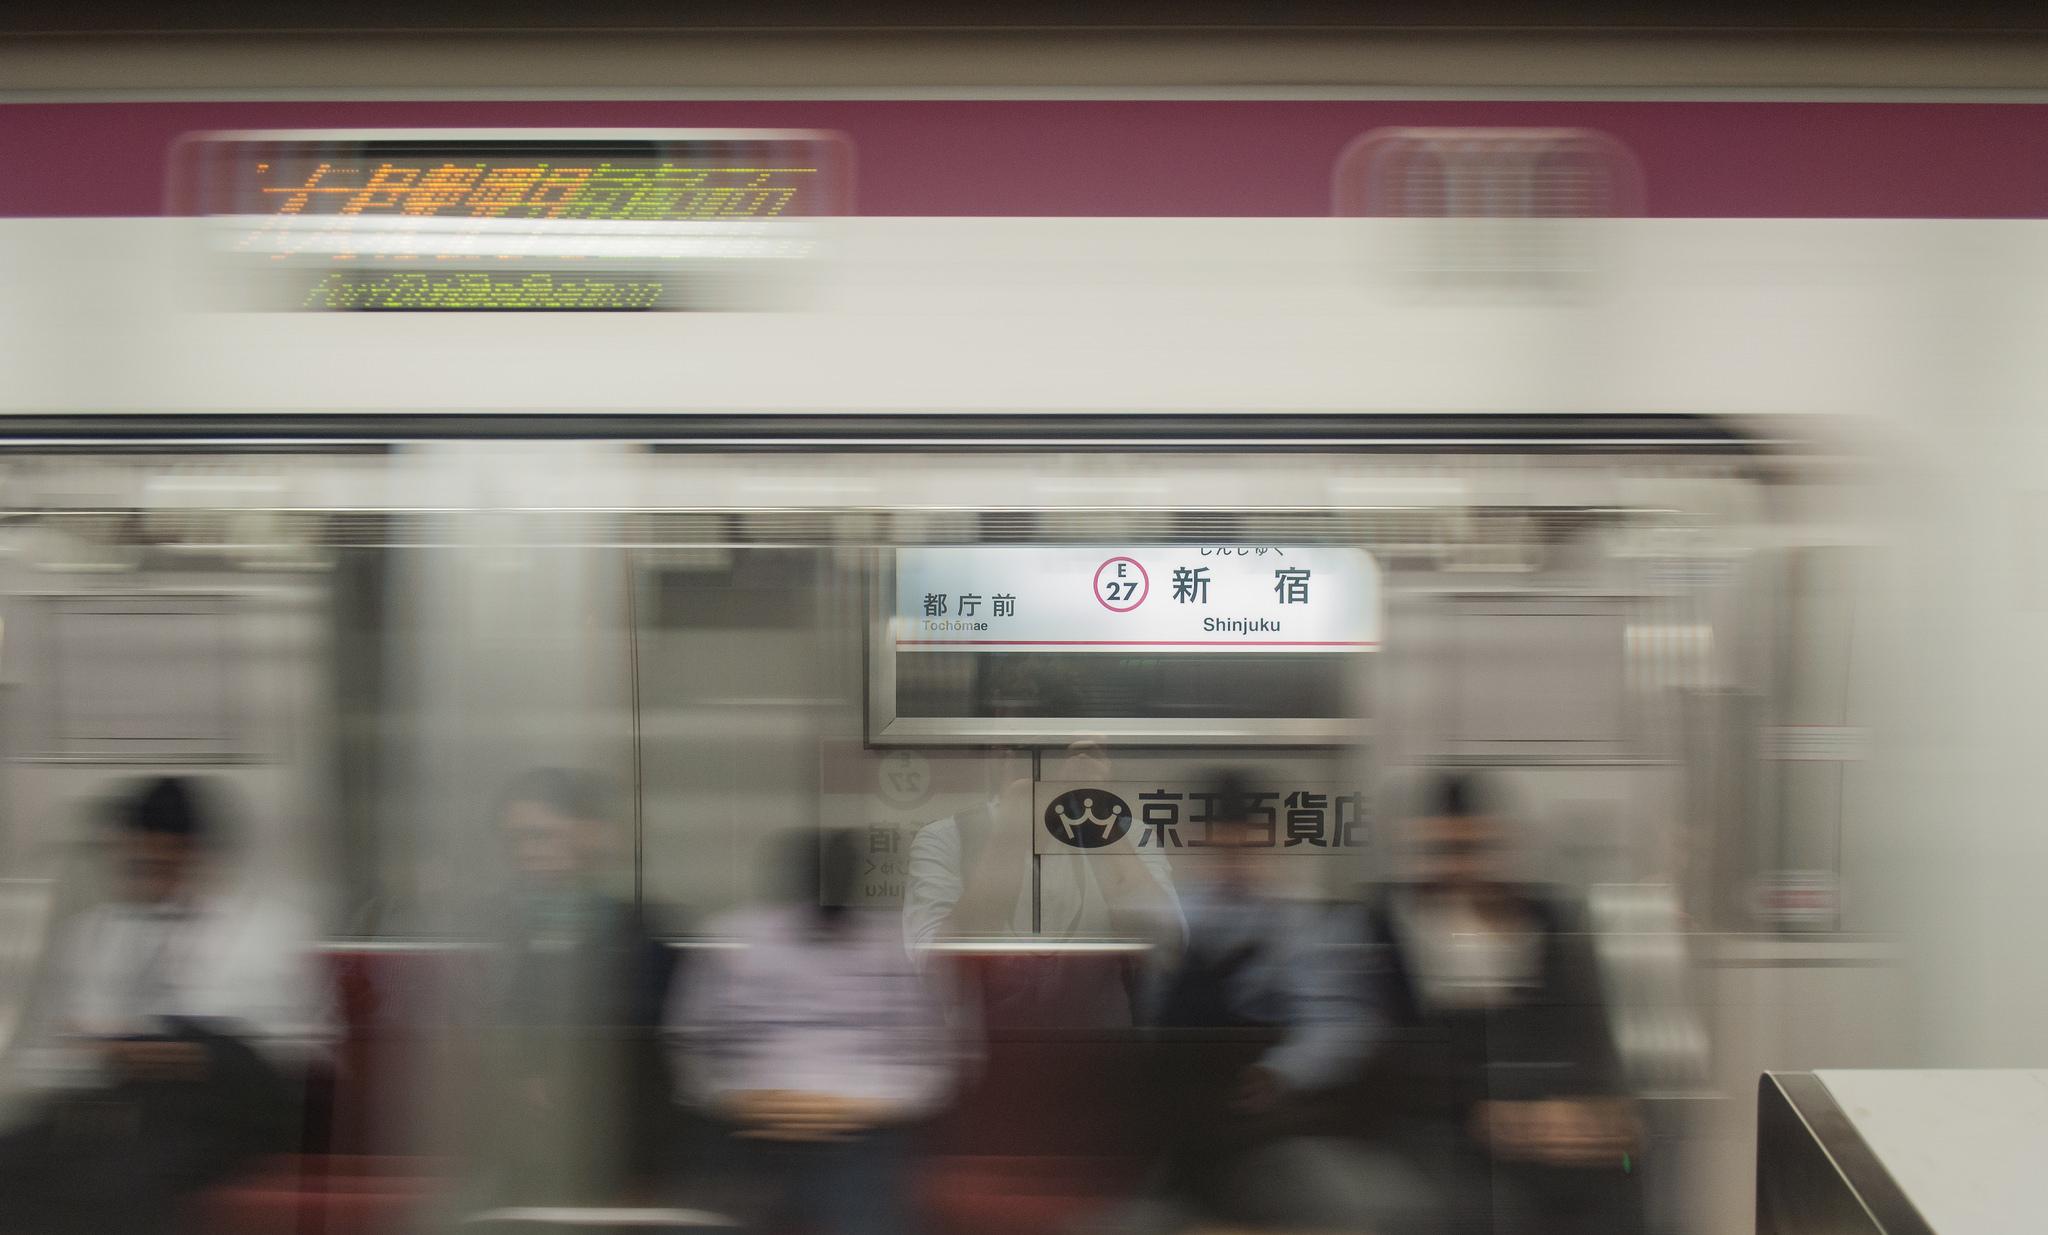 Shinjuku station, Japan